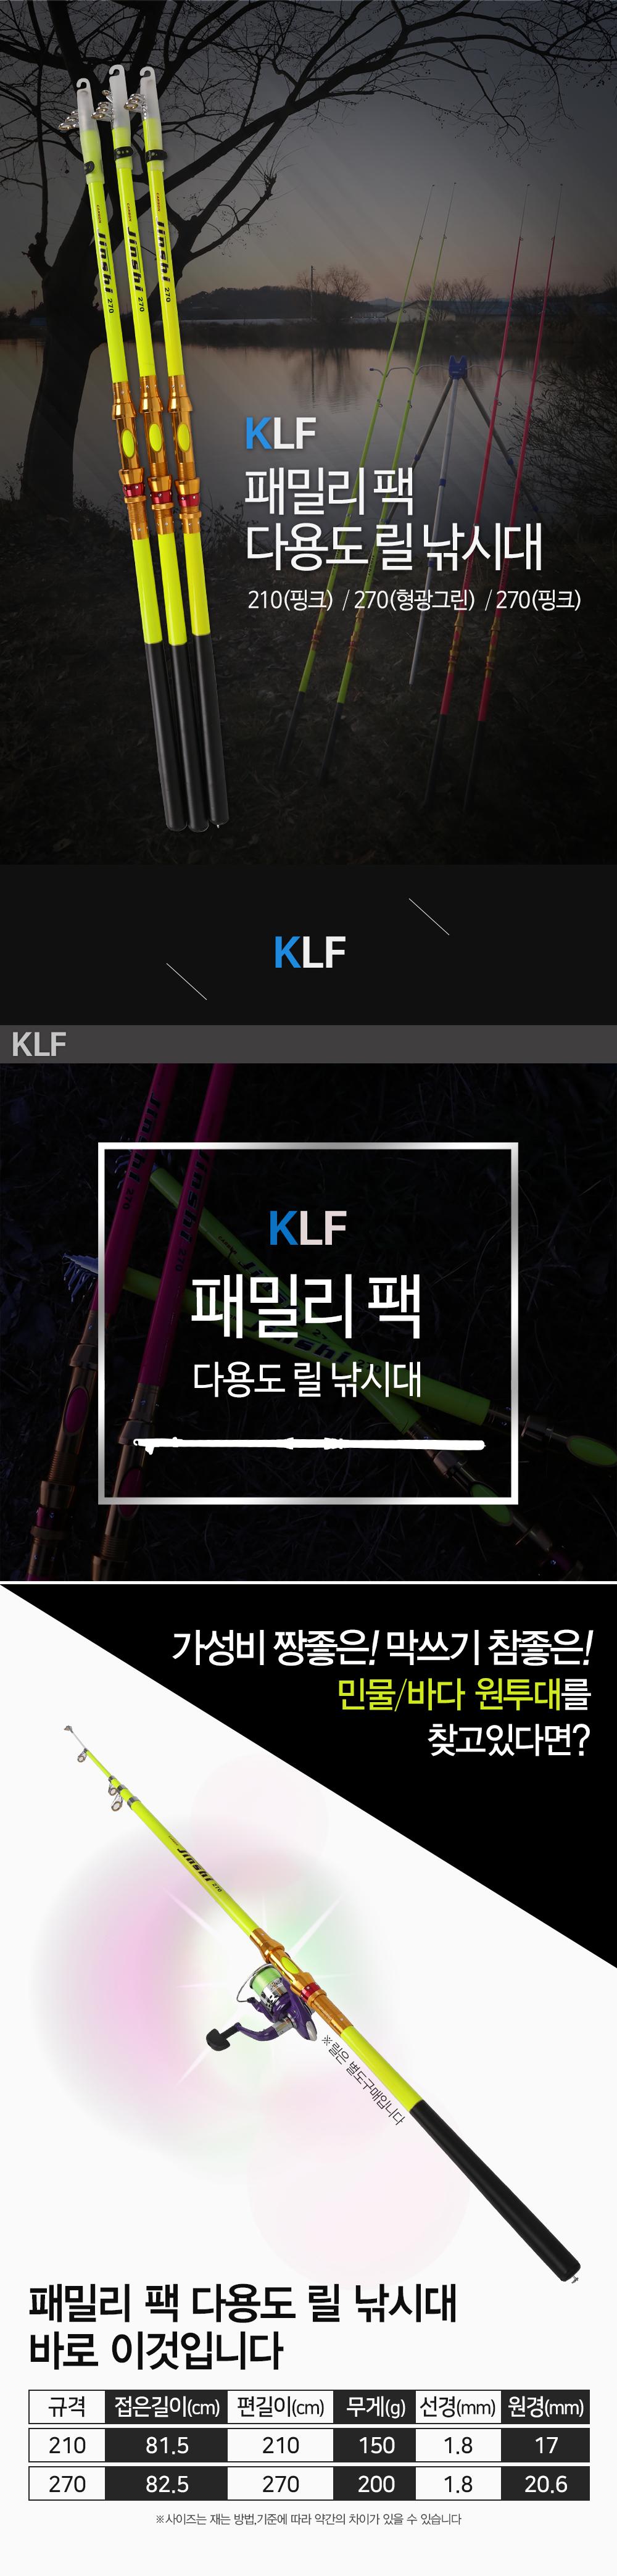 KLF 패밀리 팩 다용도 릴 낚시대 릴대 릴낚시대 바다릴낚시대 민물릴낚시대 원투대 원투낚시대 다용도릴낚시대 다용도낚시대 가족낚시대